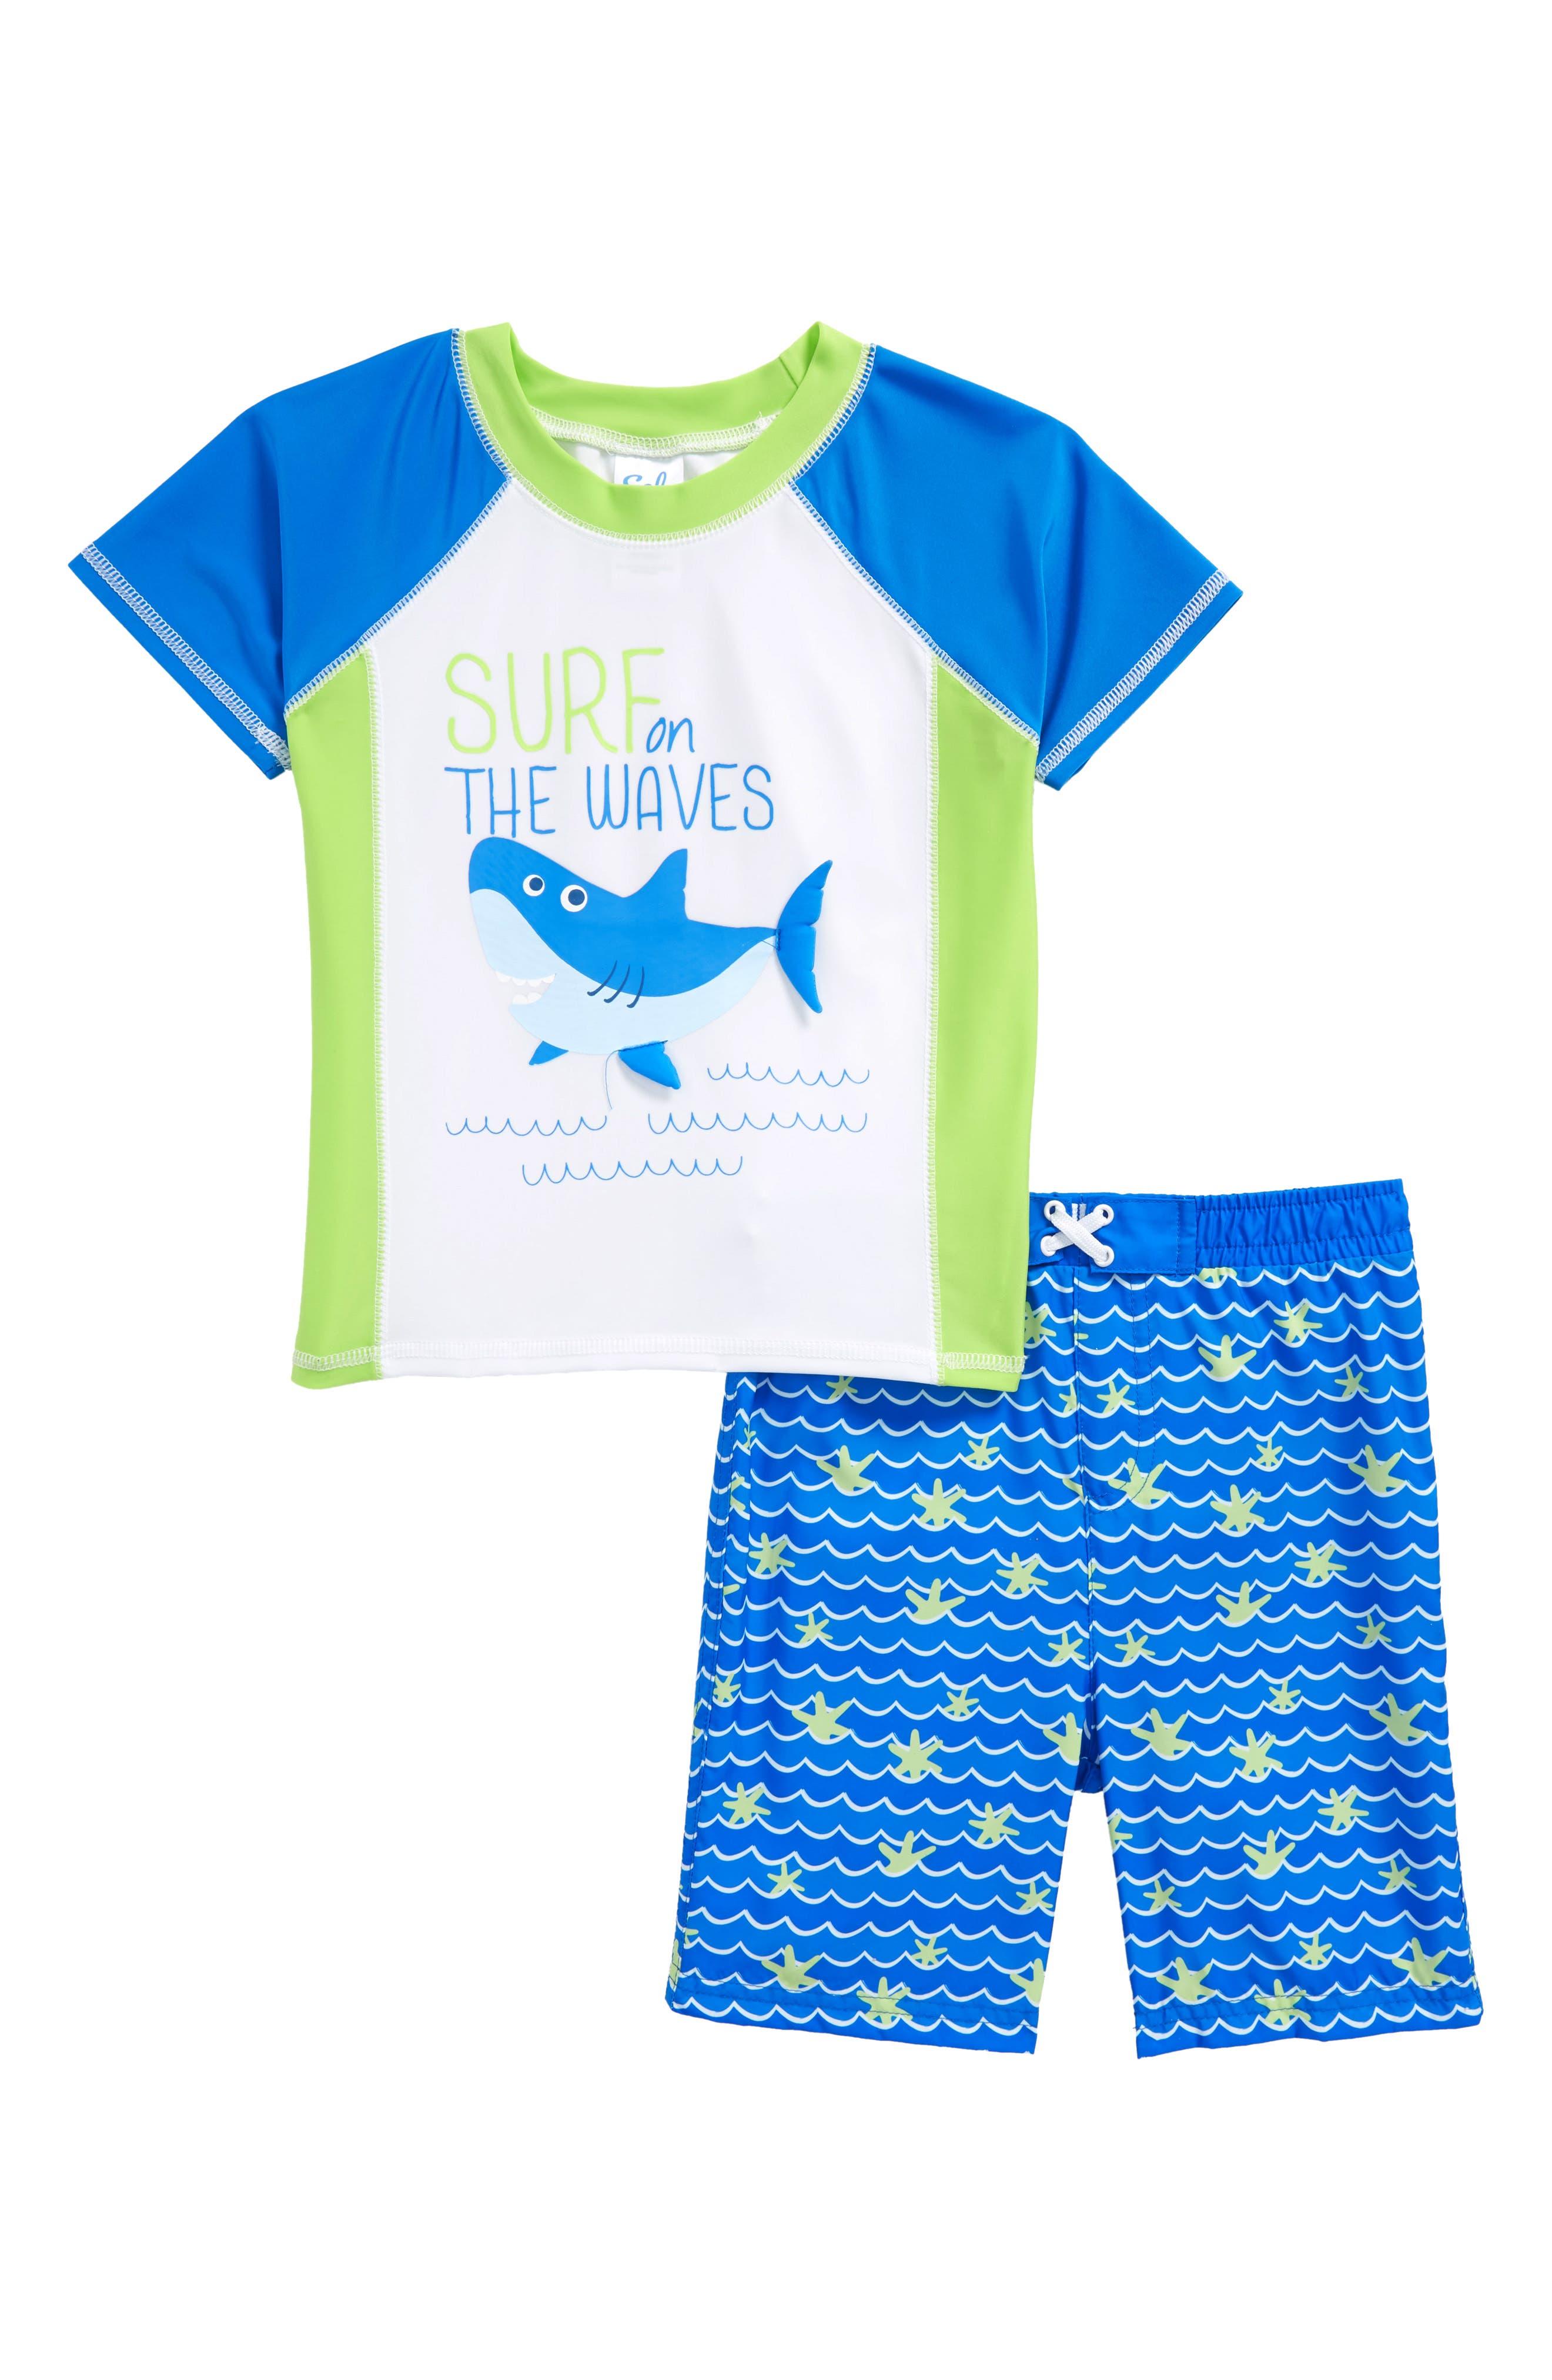 Shark Surf Two-Piece Rashguard Swimsuit,                             Main thumbnail 1, color,                             400